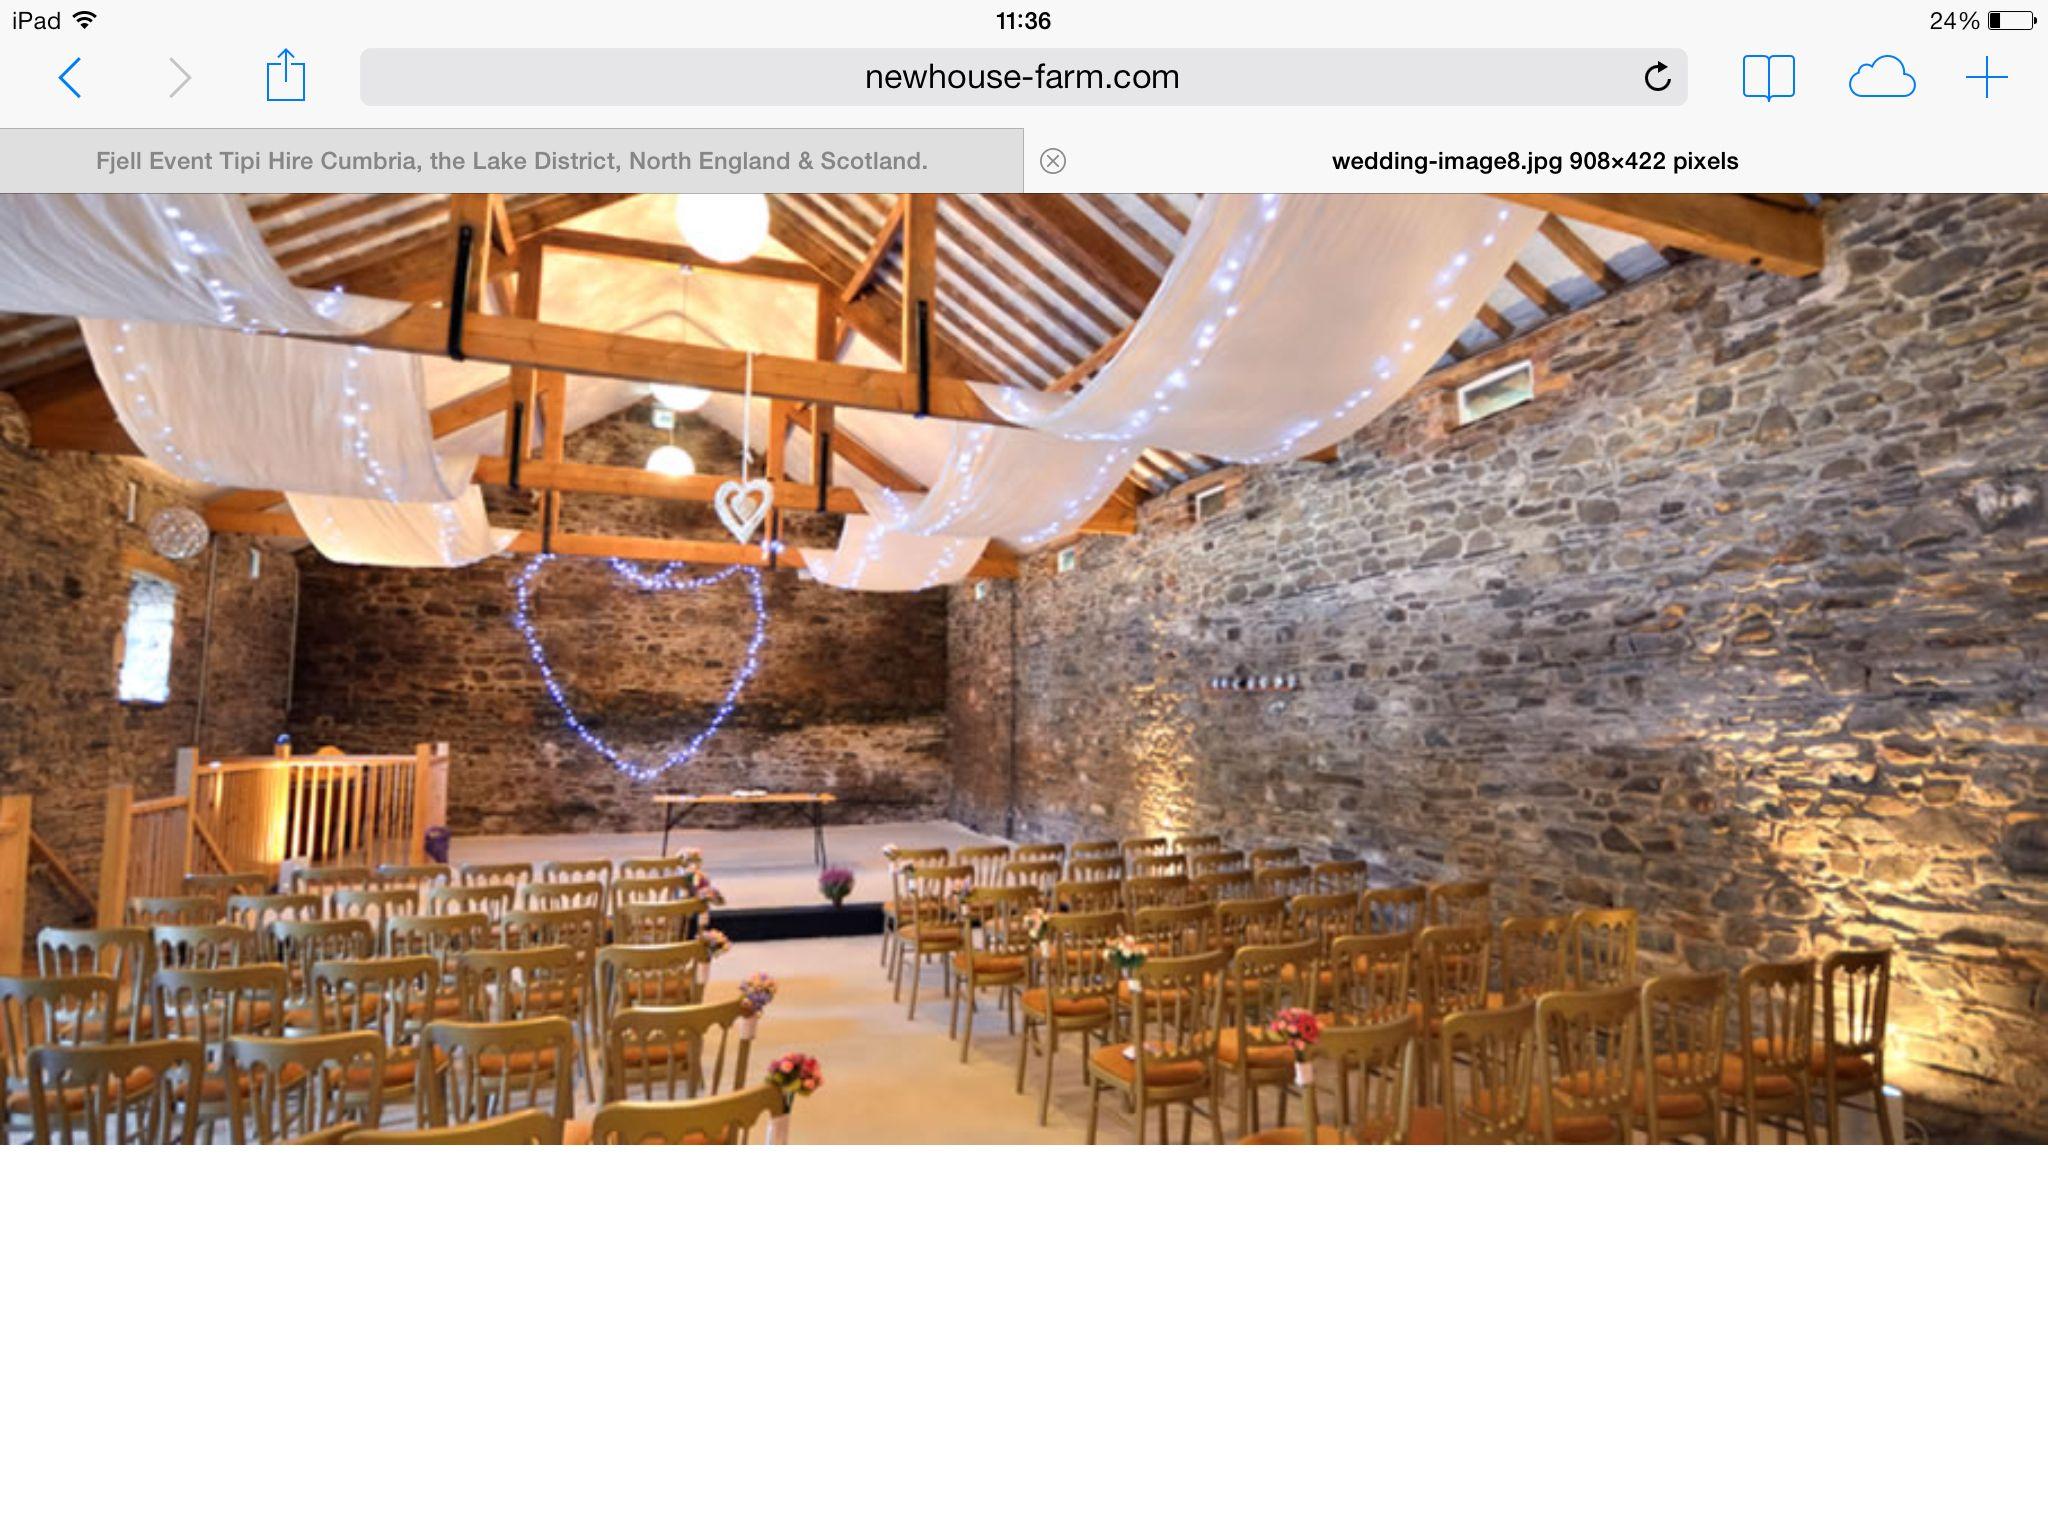 wedding reception venues north yorkshire%0A New House Farm Lorton